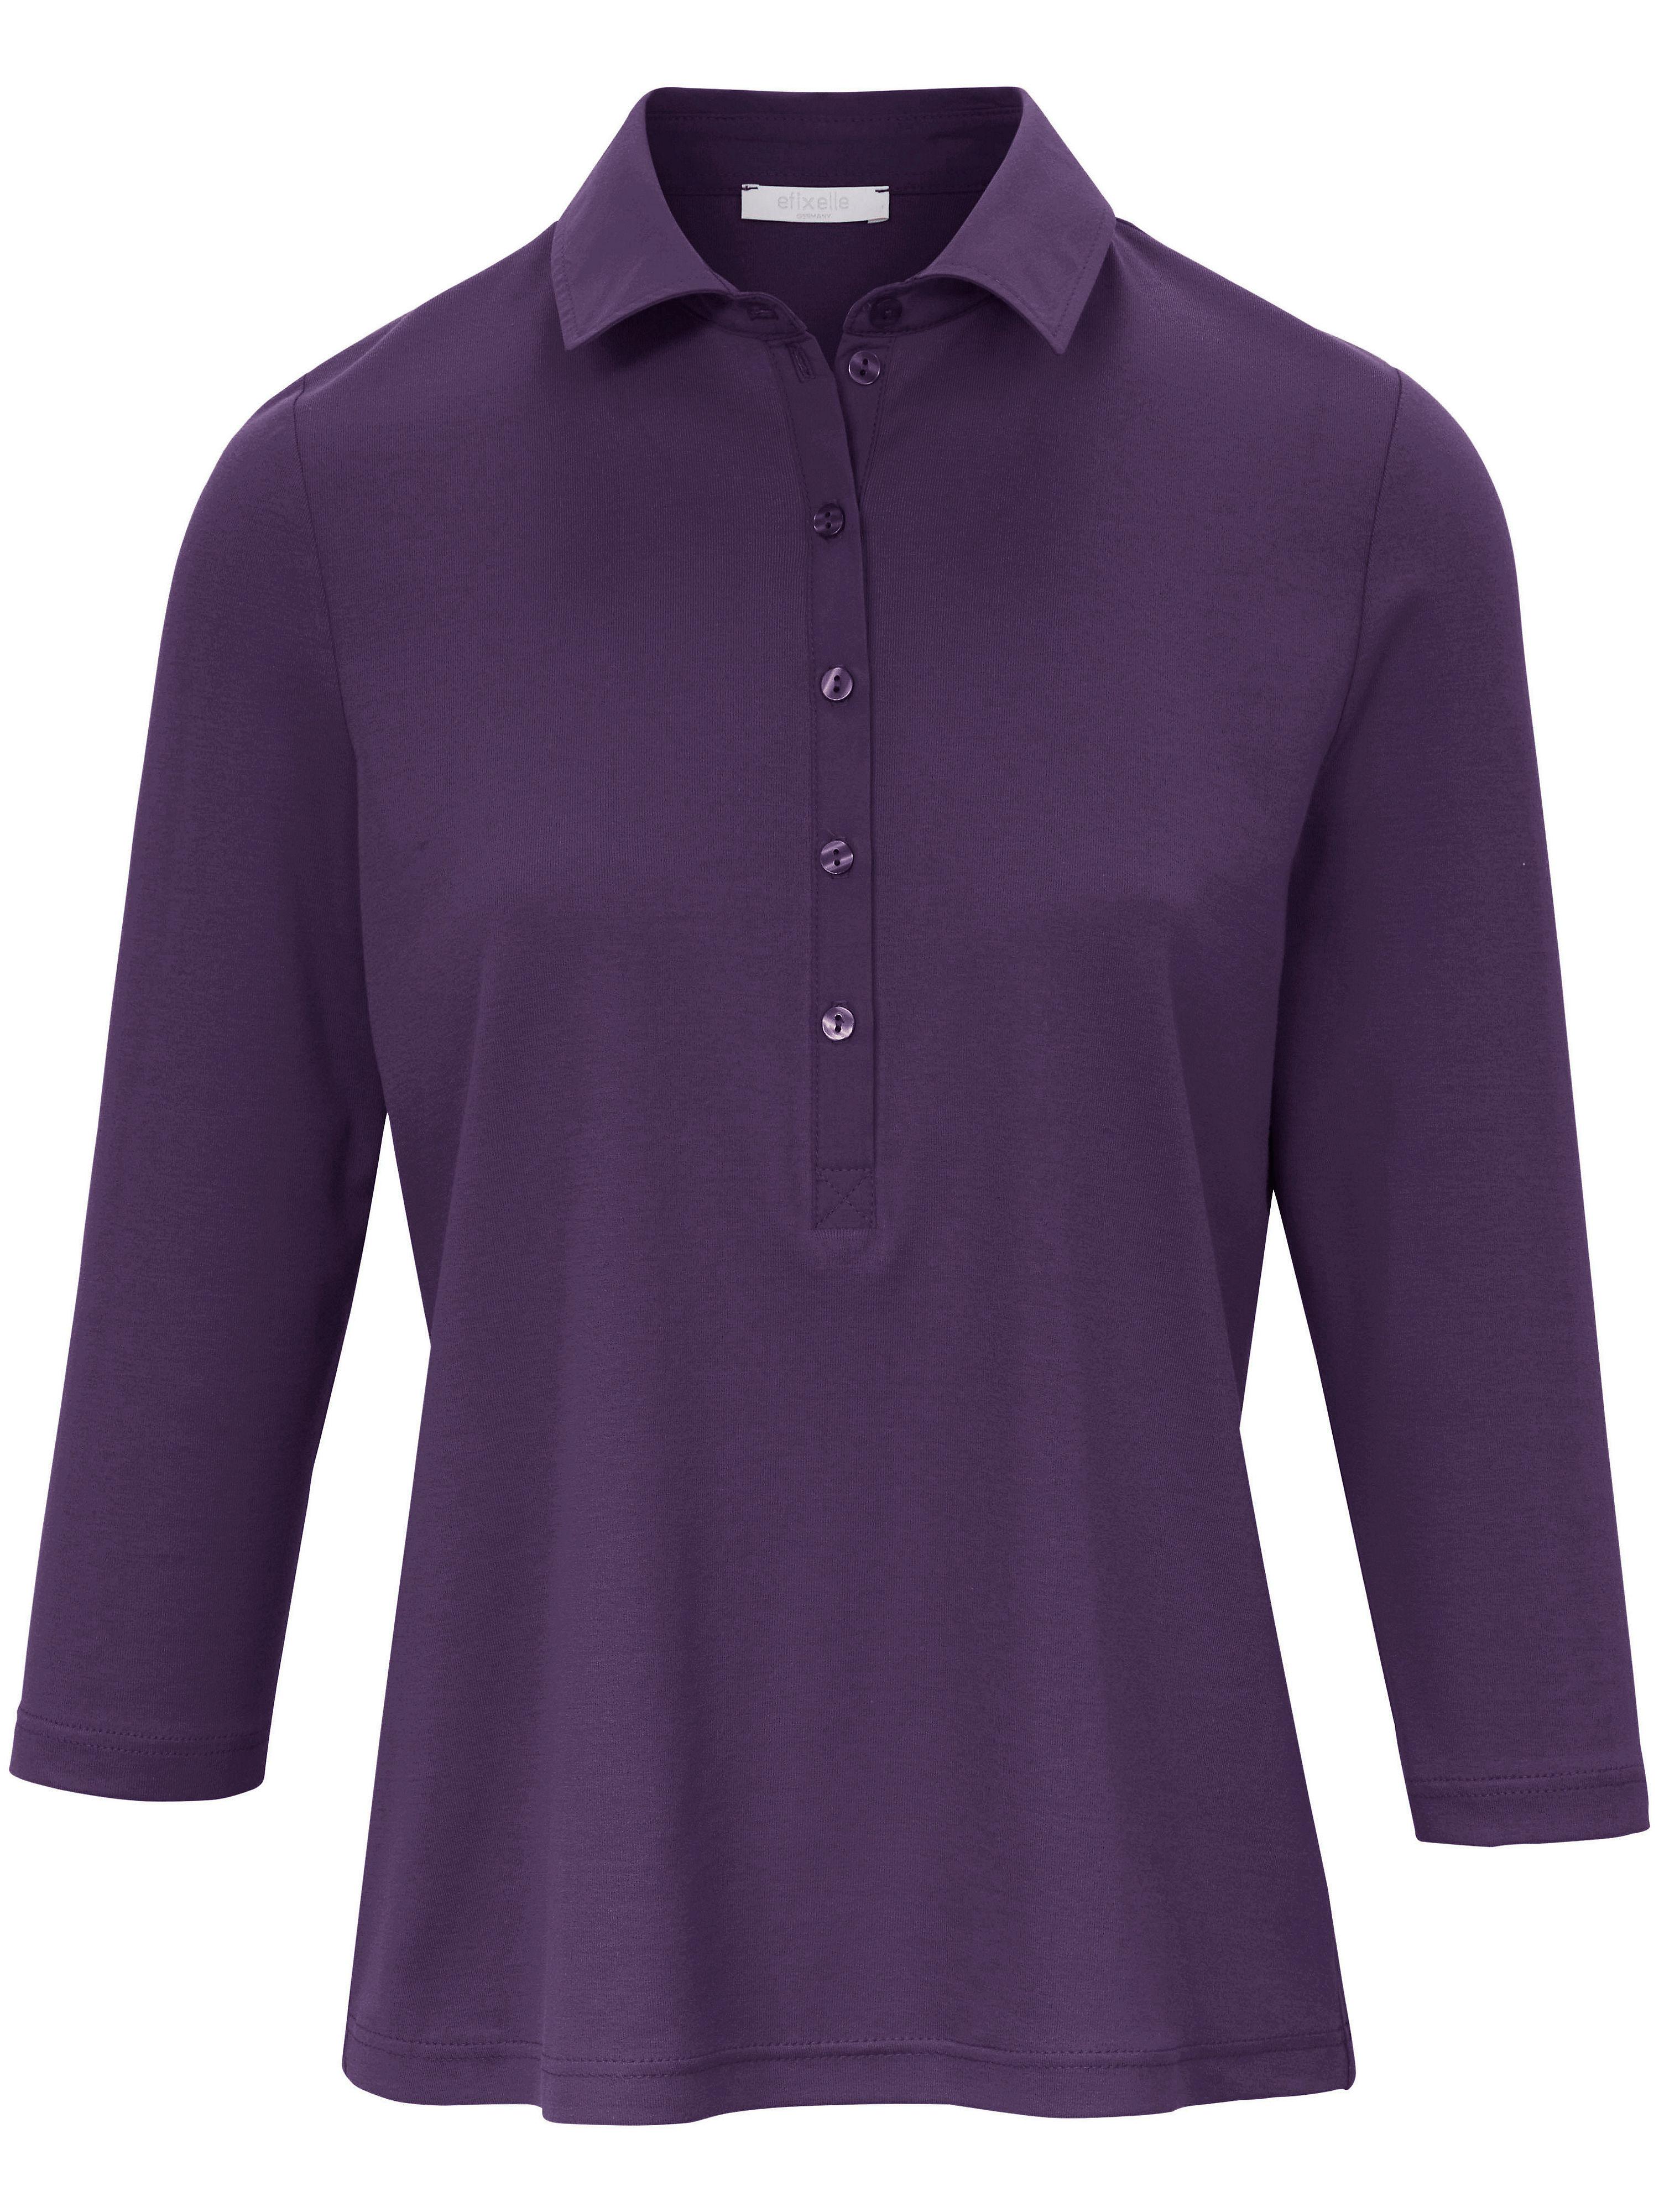 Polo-Shirt 3/4-Arm Efixelle lila | Bekleidung > Shirts | Glanz | Interlock - Jersey - Baumwolle | Efixelle